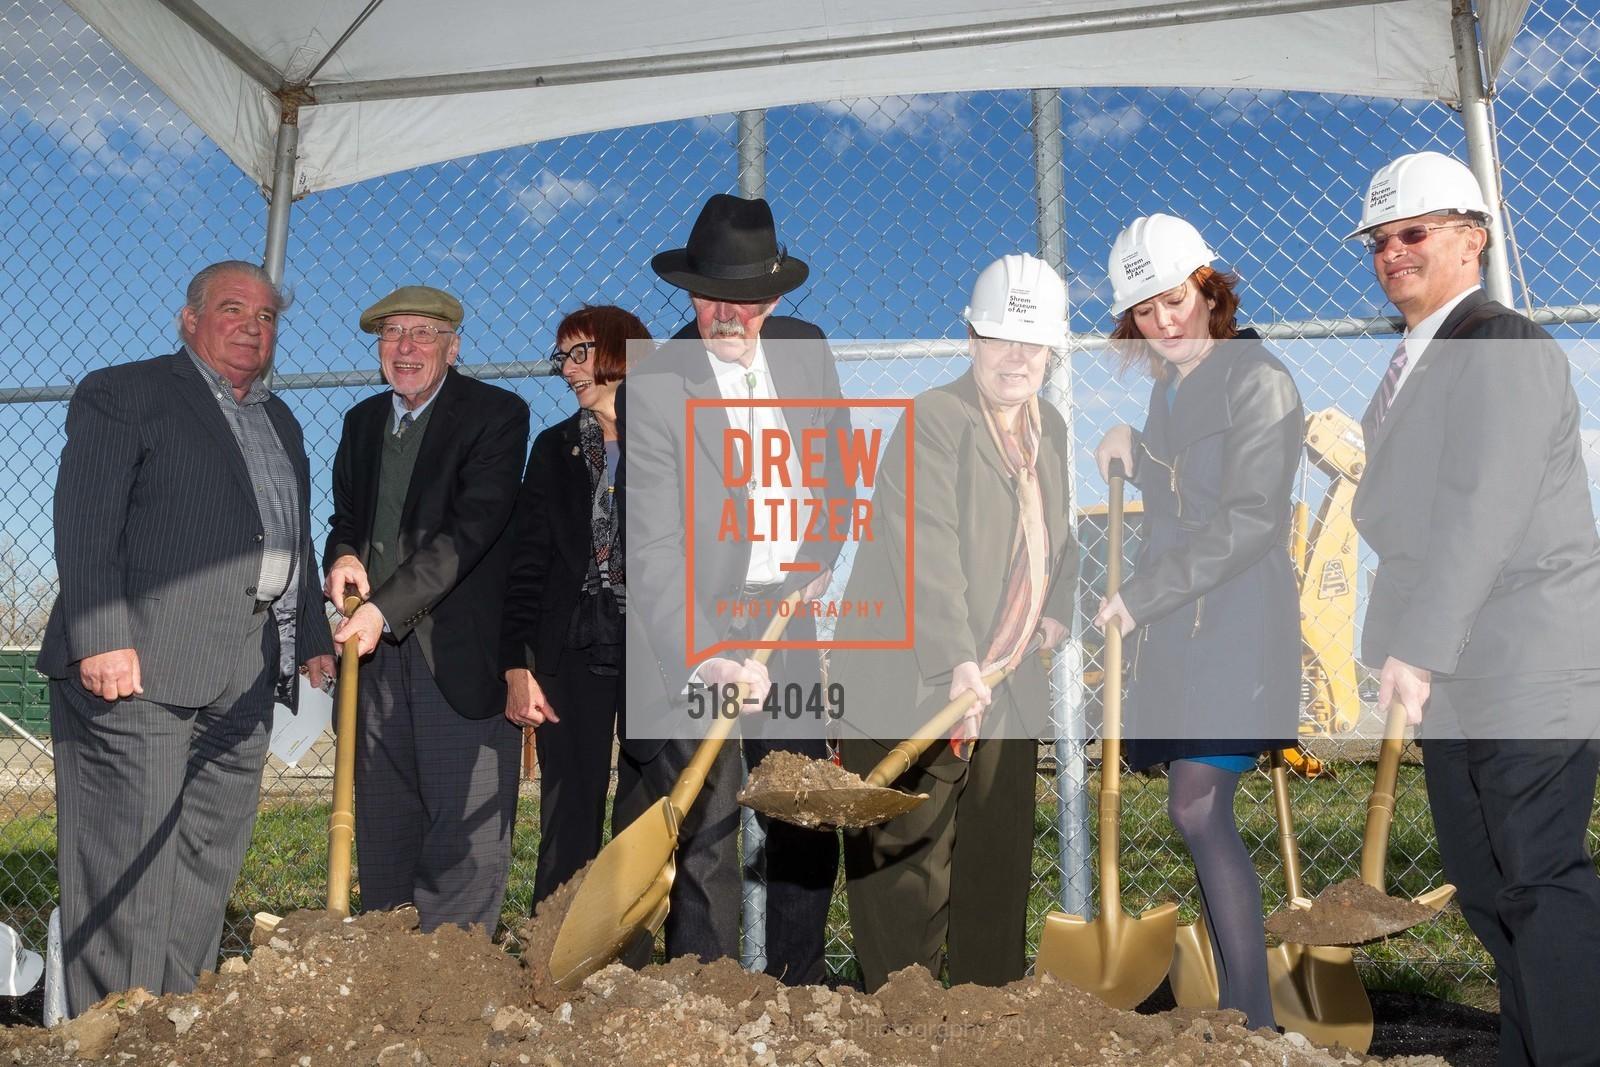 Irving Marcus, Sandy Shannonhouser, Lee Wiley, Jessie Ann Owens, Rachel Teagle, Ralph Hexter, Photo #518-4049